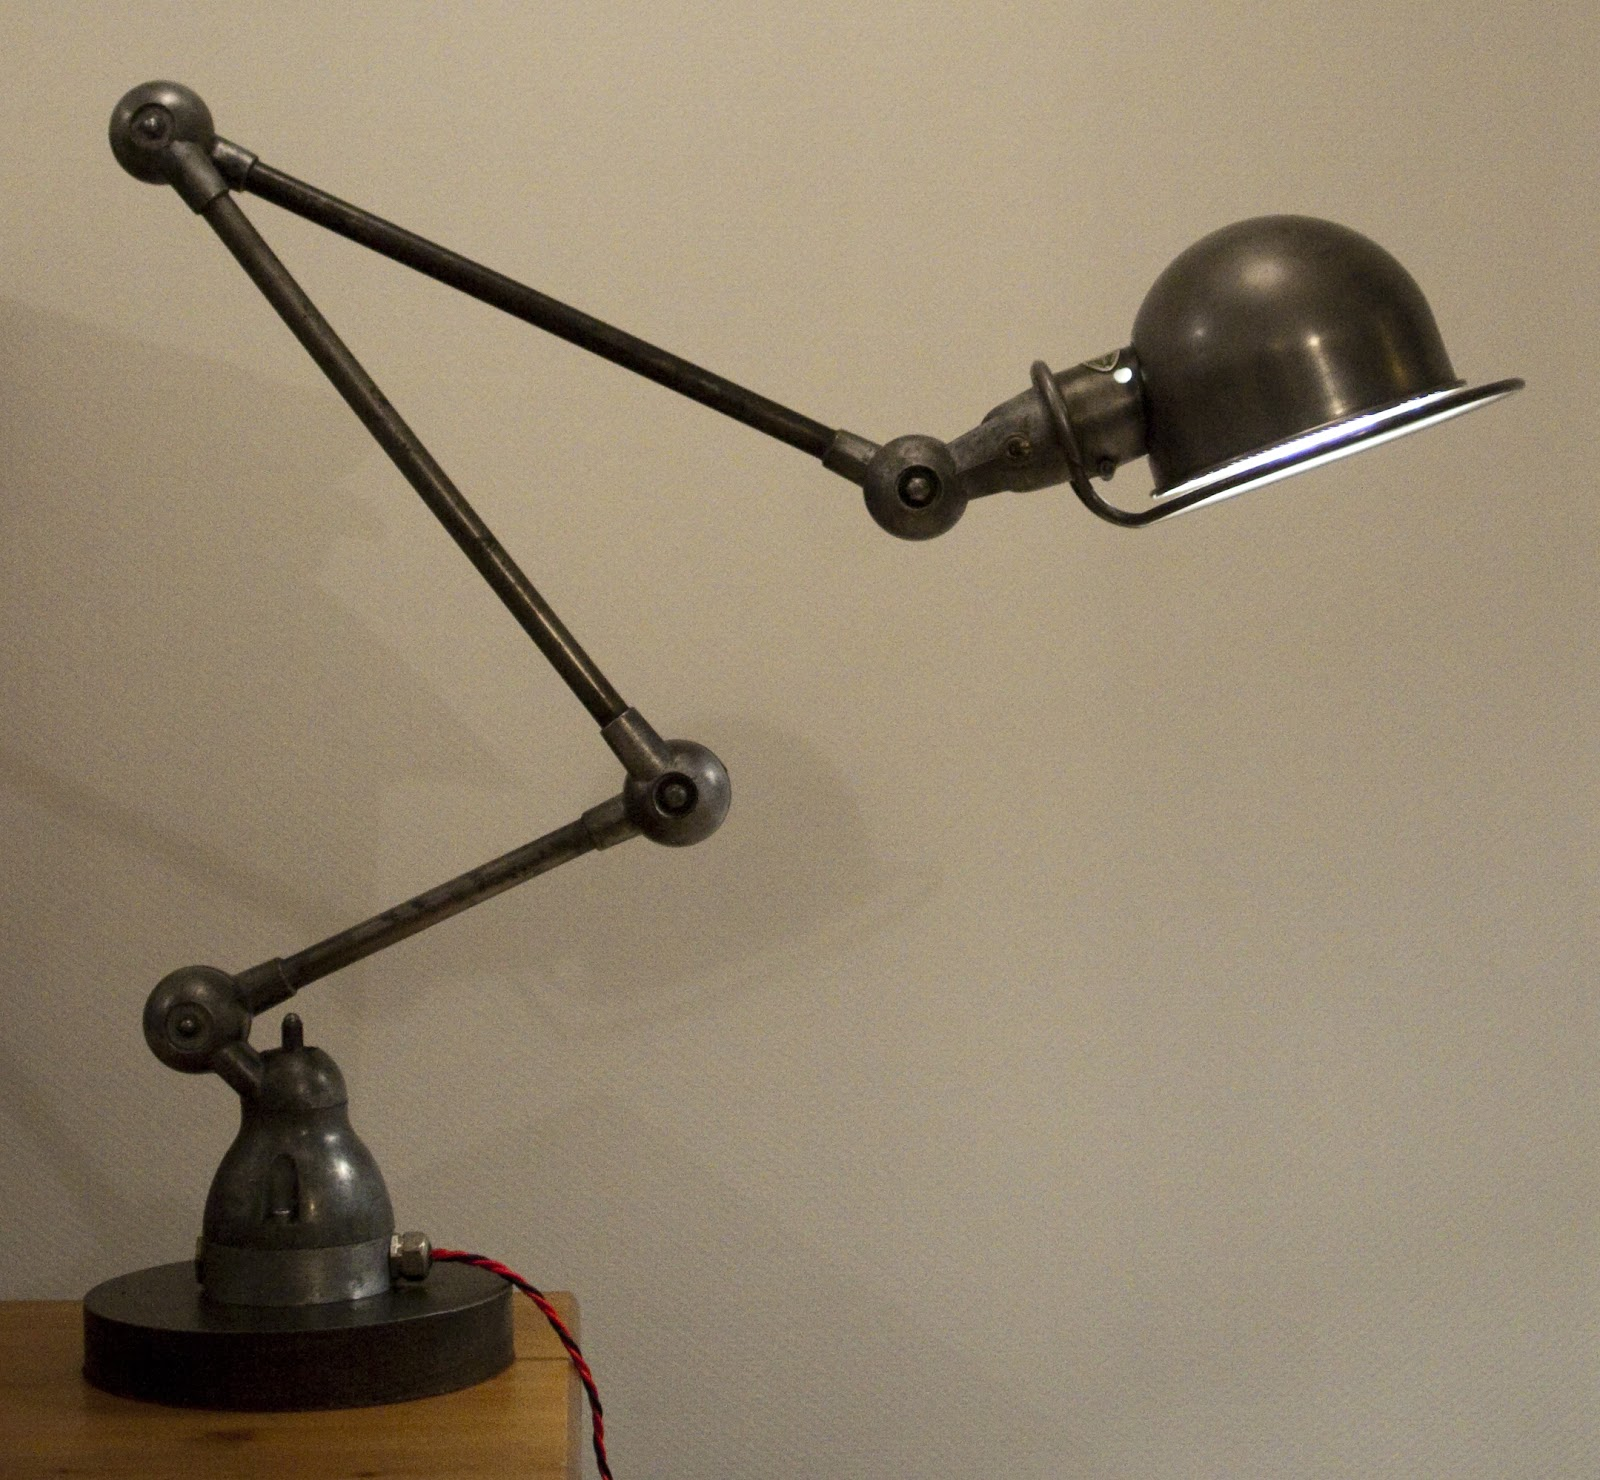 frank b 06 nouvelle lampe jielde 3 bras sur pied lourd new jielde lamp with 3 arms on heavy. Black Bedroom Furniture Sets. Home Design Ideas